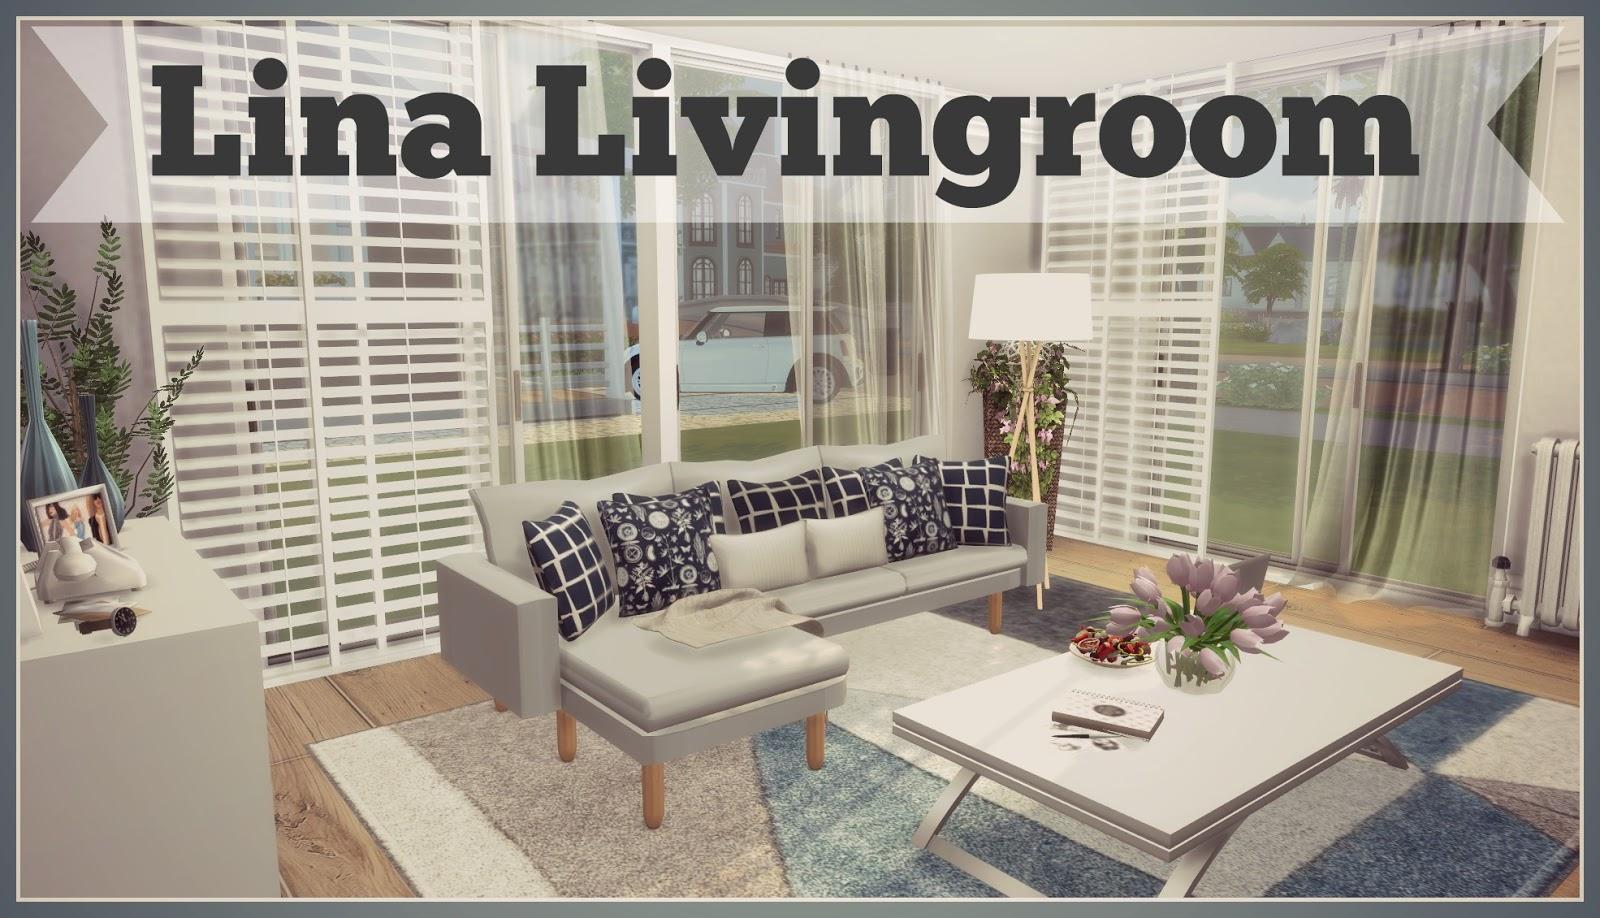 Sims 4 - Lina Livingroom (Download + CC Creators Links) - Dinha